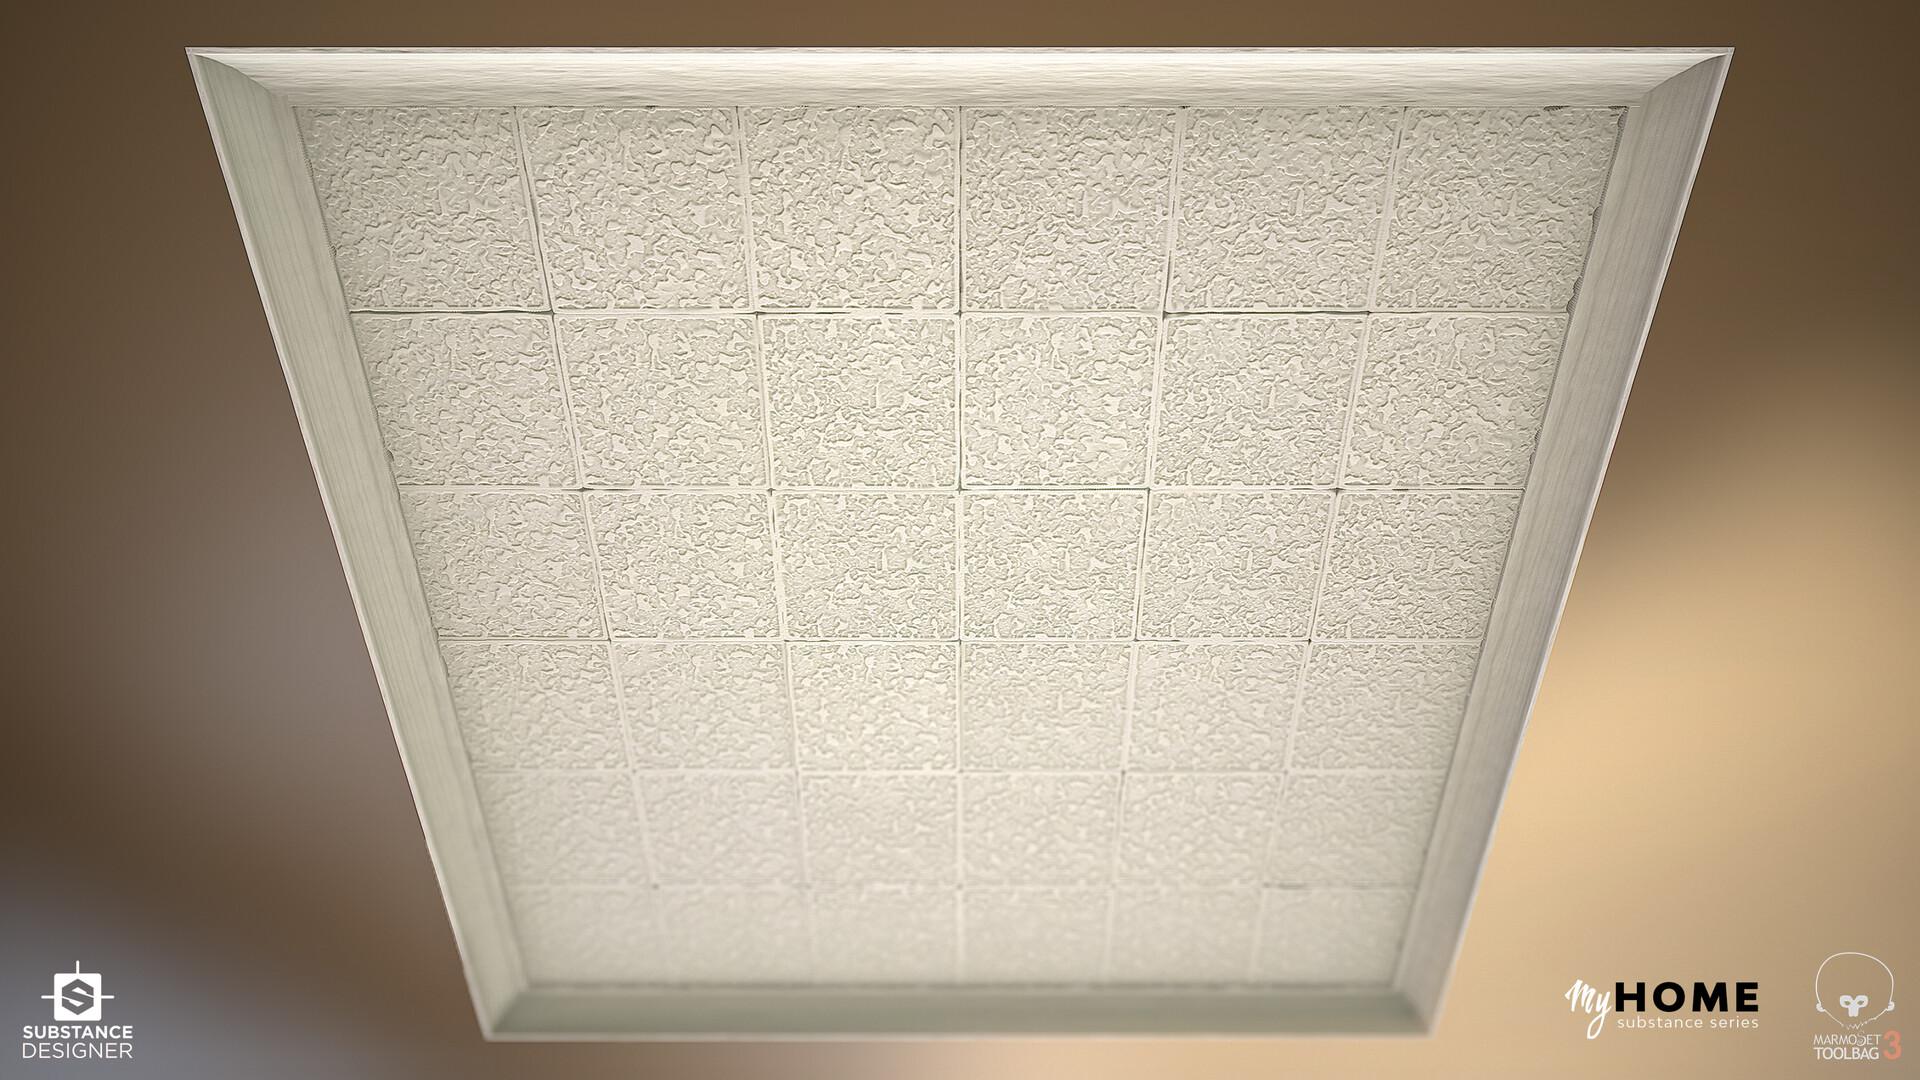 Gregory bove myroom ceiling render01